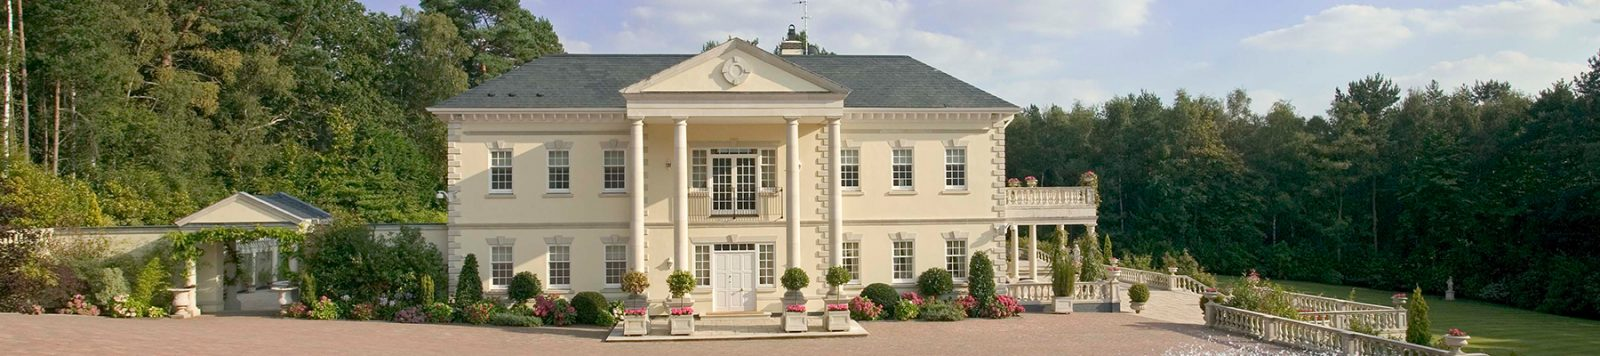 Manor house Hodson Development Awards